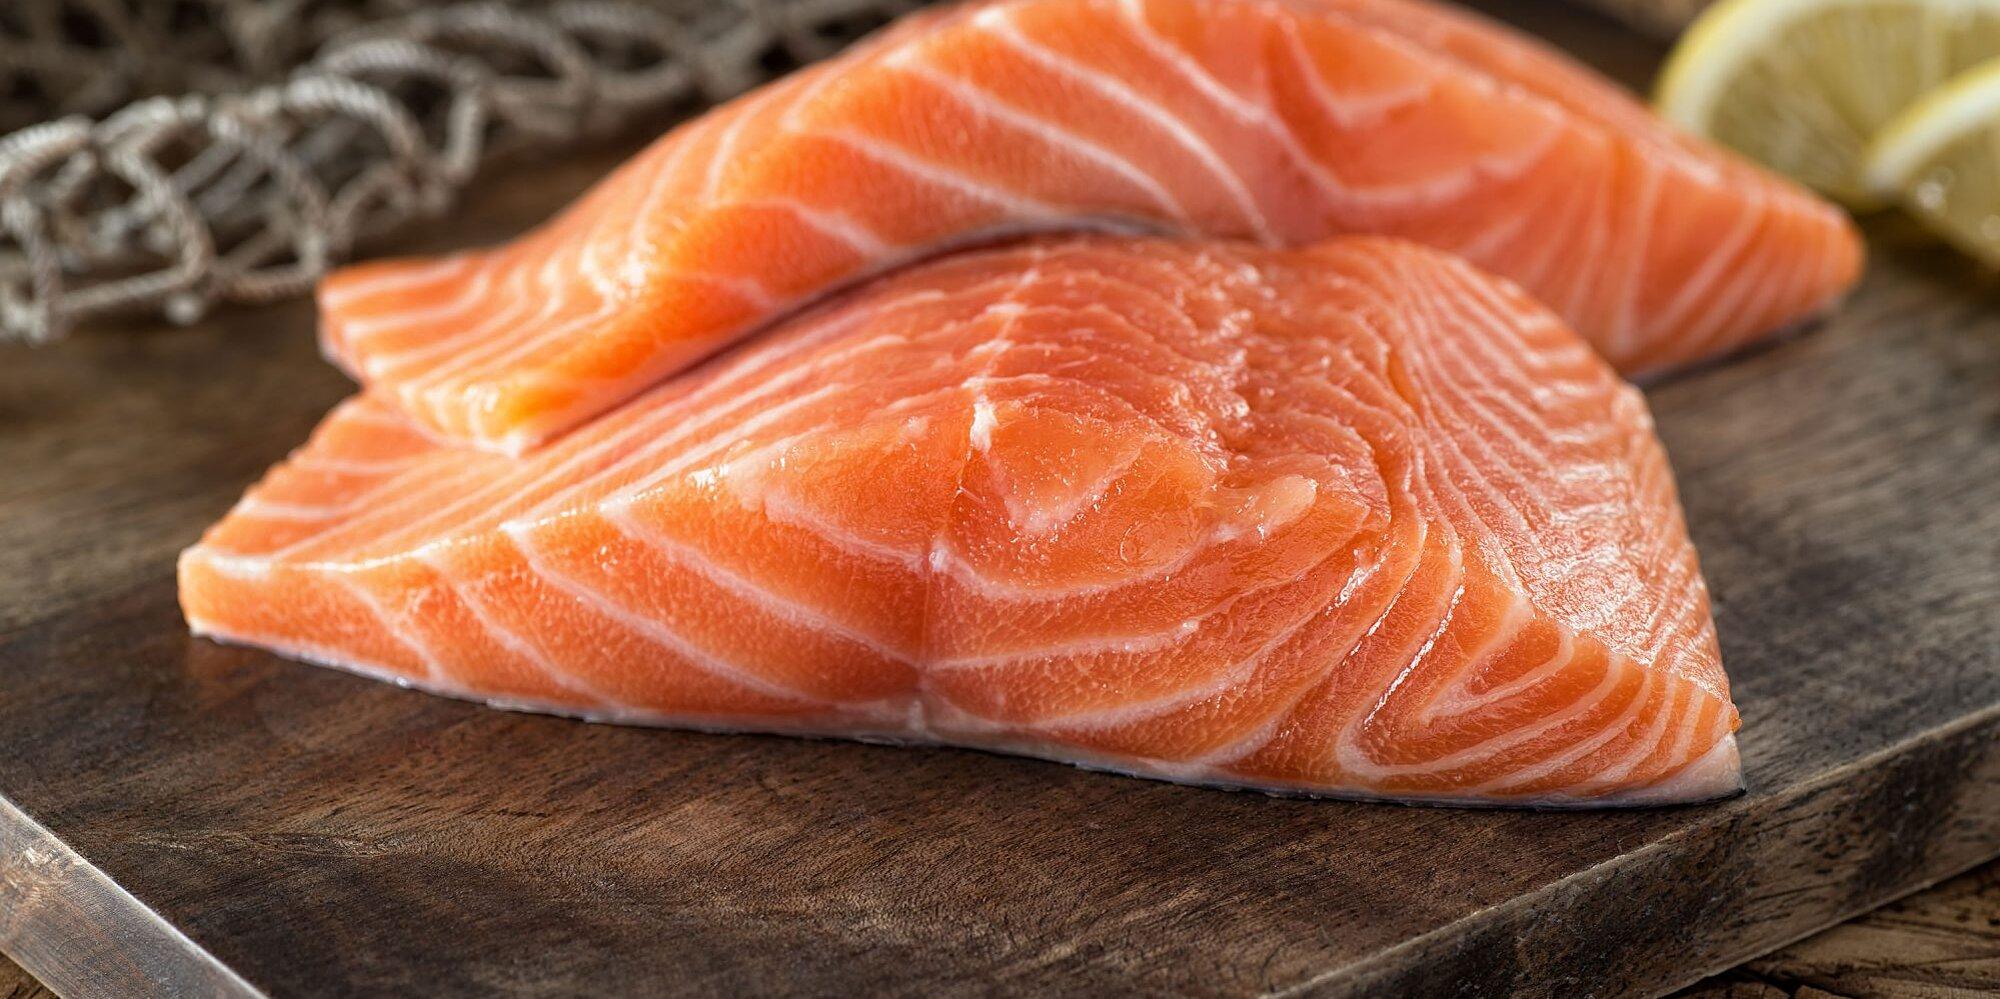 Salmon and its health benefits